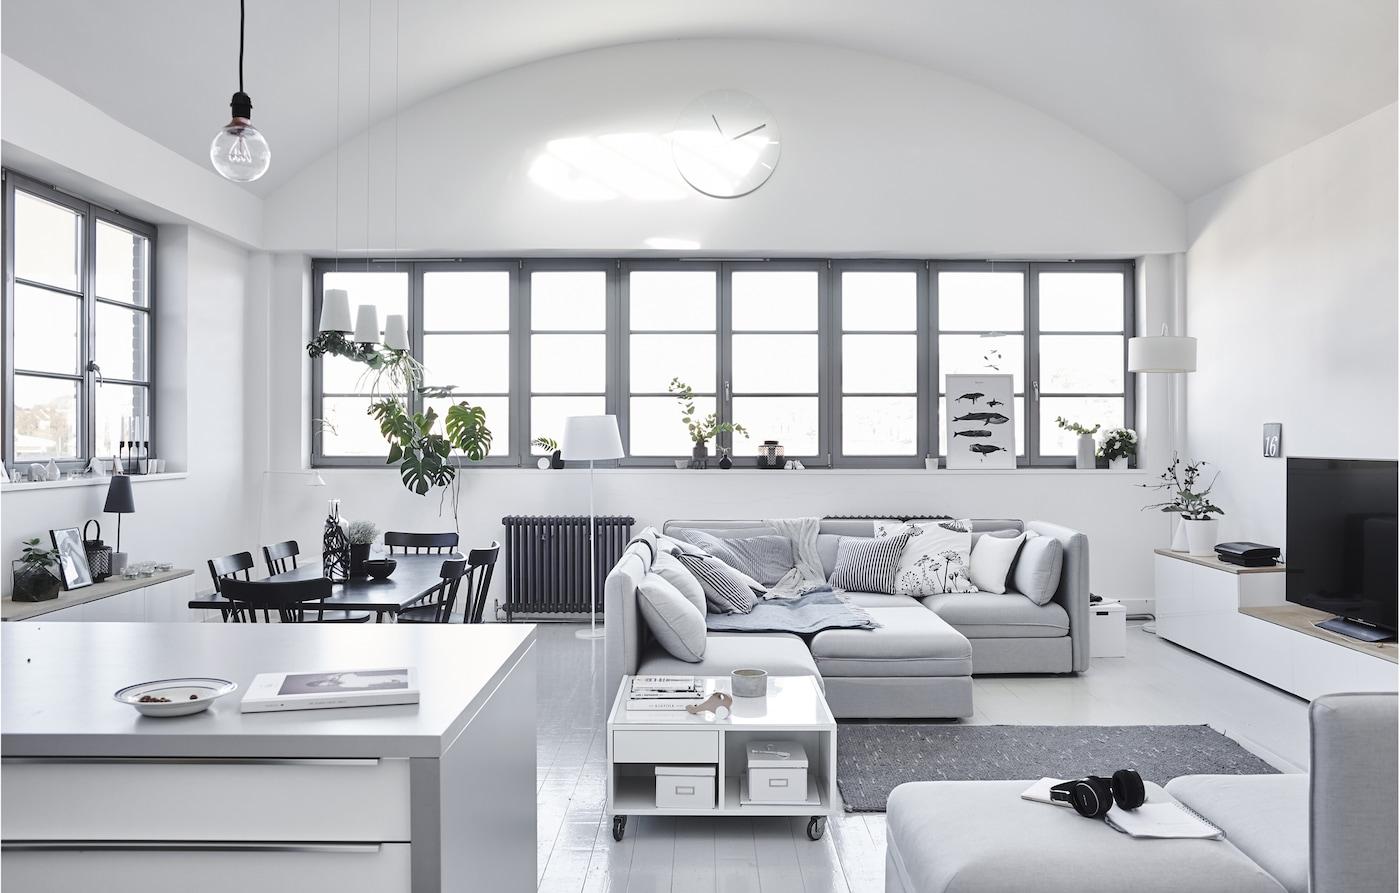 Cómo crear un hogar familiar minimalista ikea